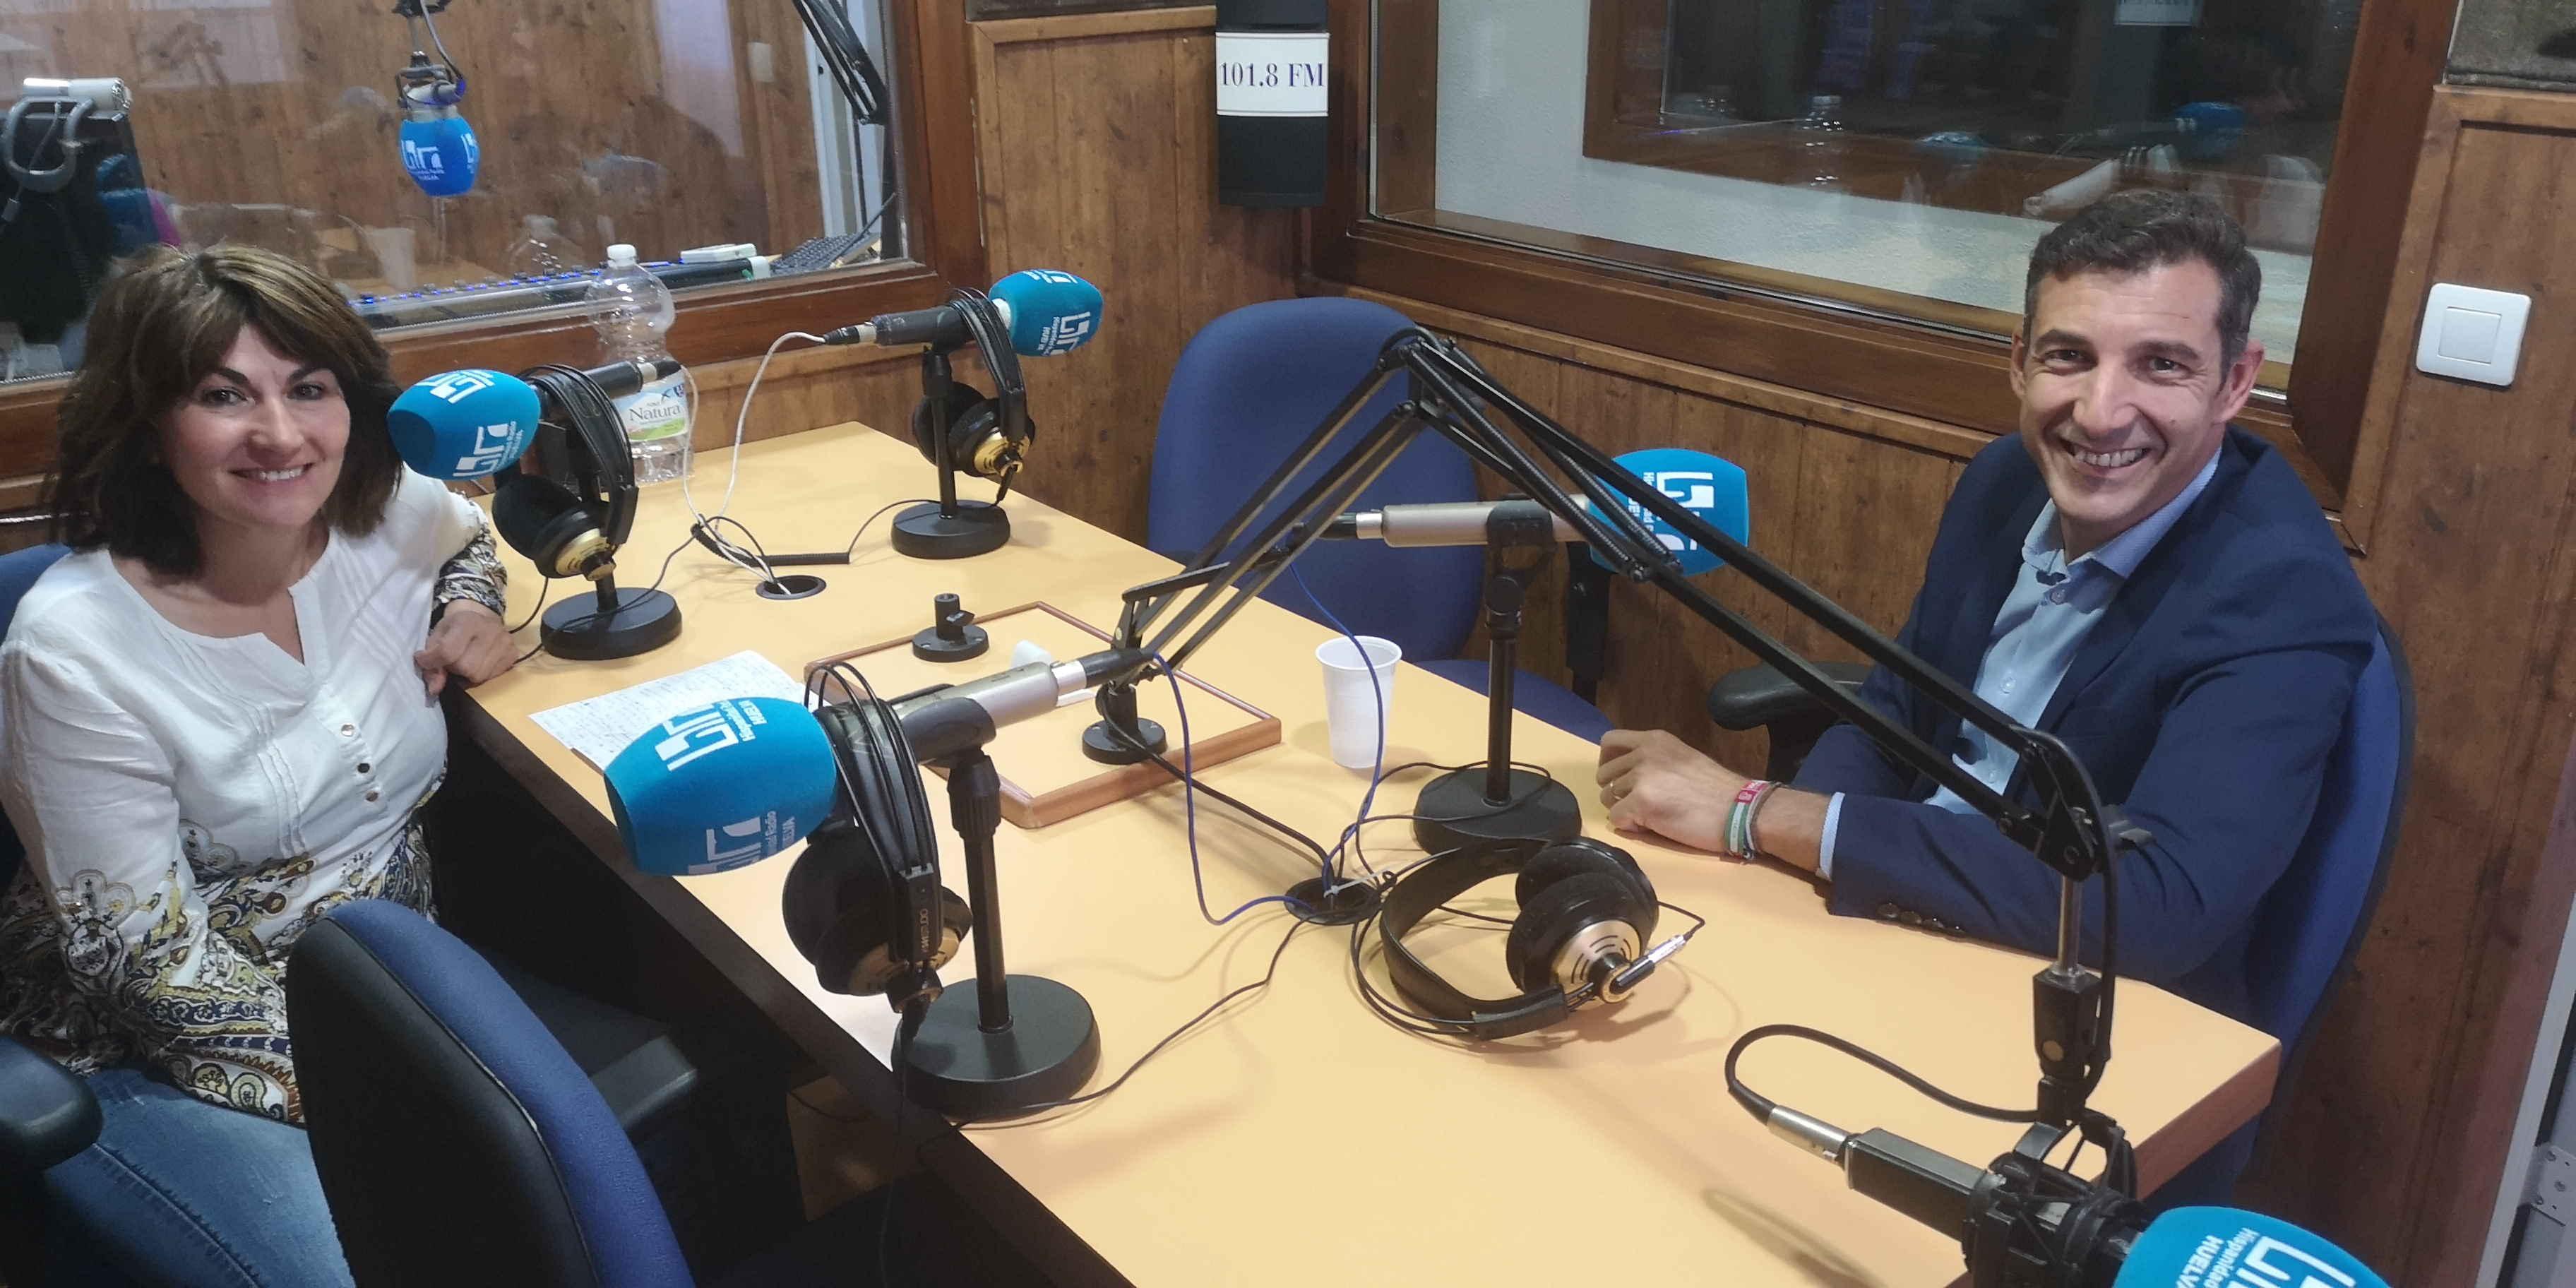 Queremos Saber 25-10-2019 Jesús González, Candidato N3 al Senado por PSOE de Huelva